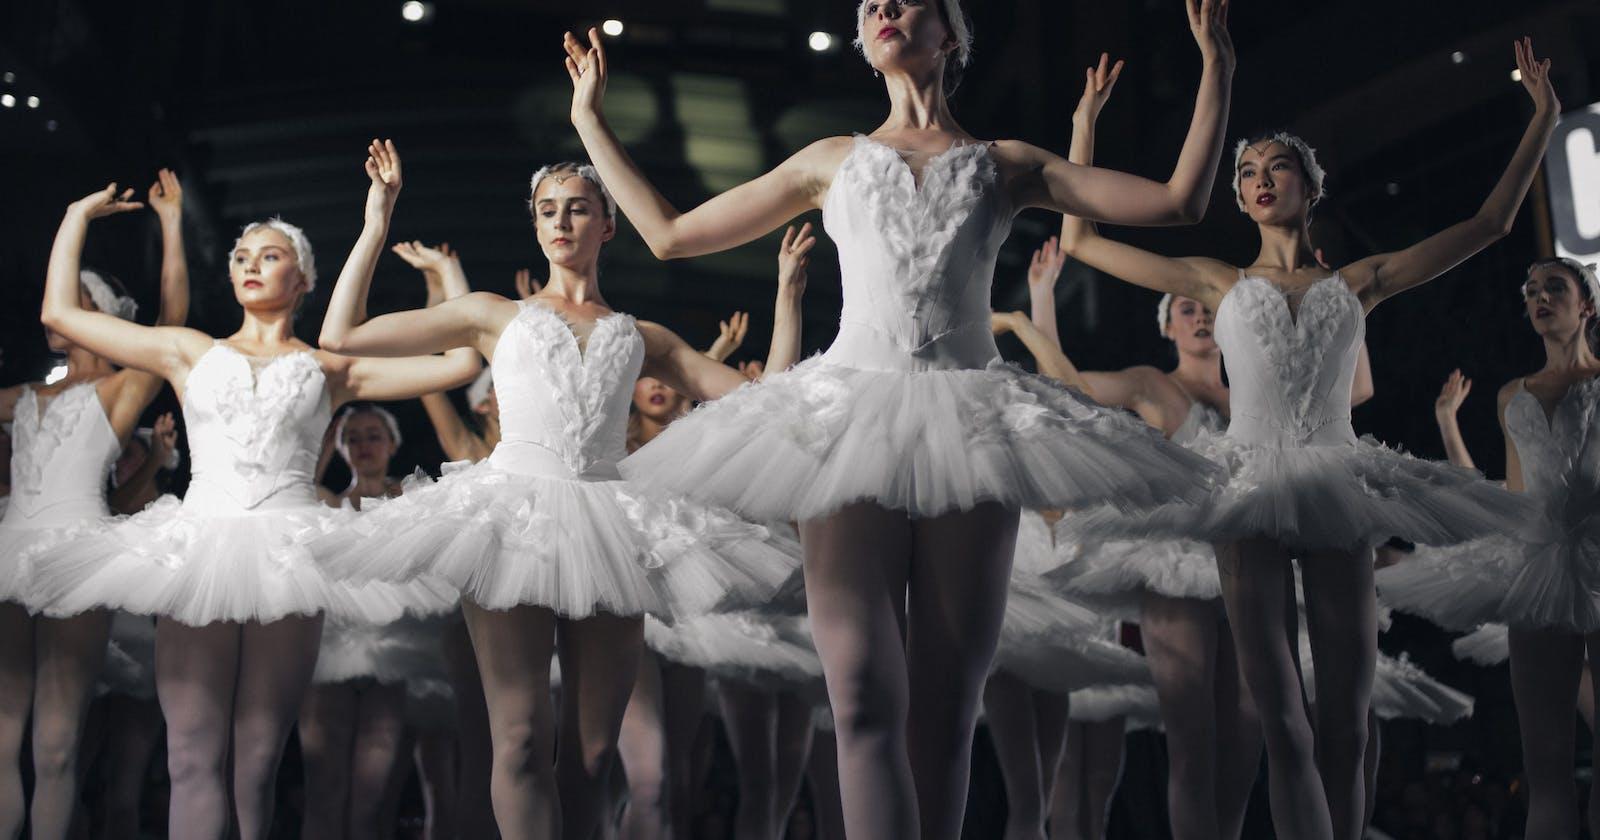 First glimpse of Ballerina language: Language of Integration